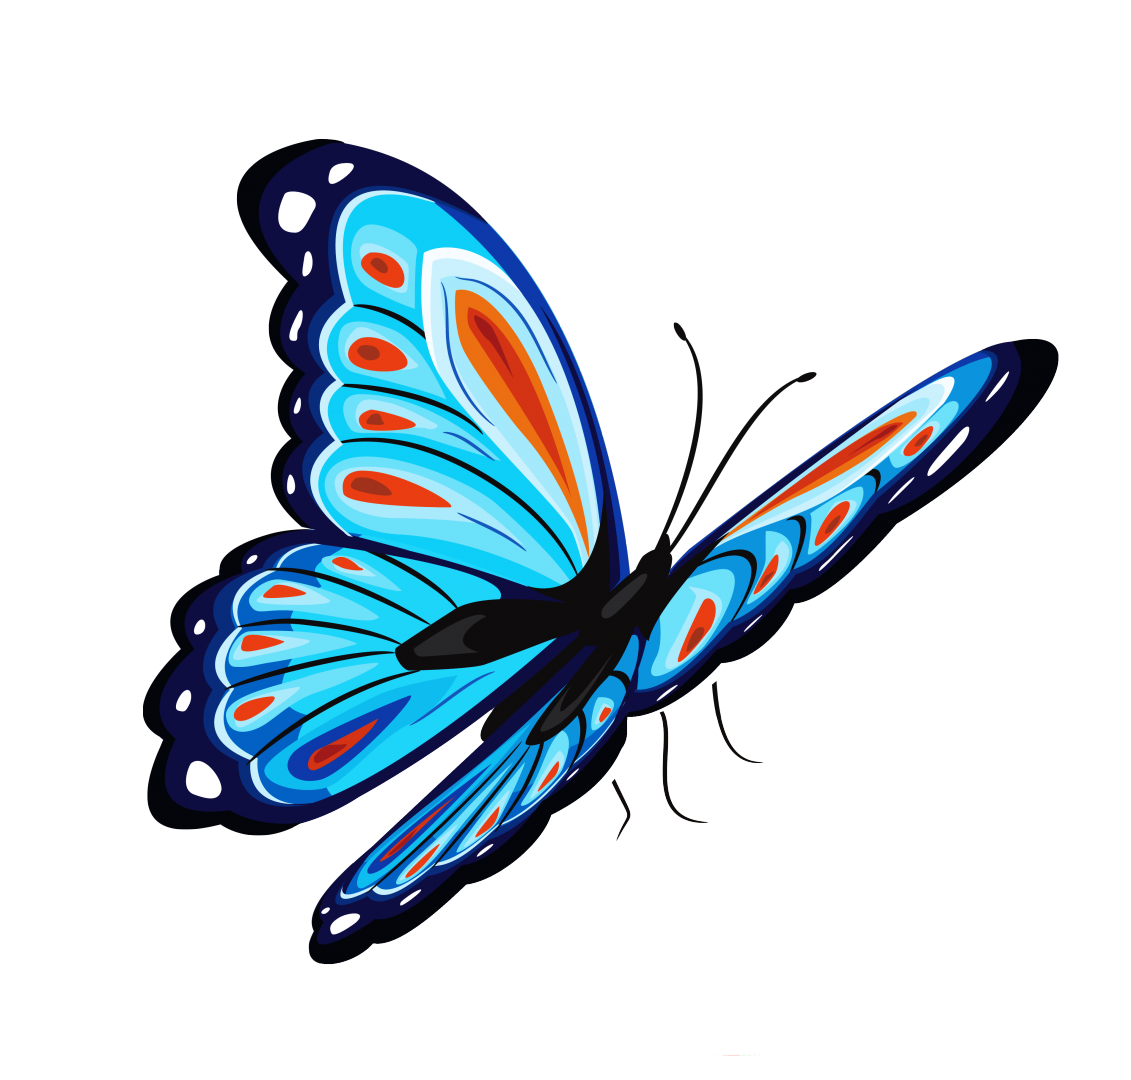 Картинка бабочки анимация на прозрачном фоне, самому желанному любимому